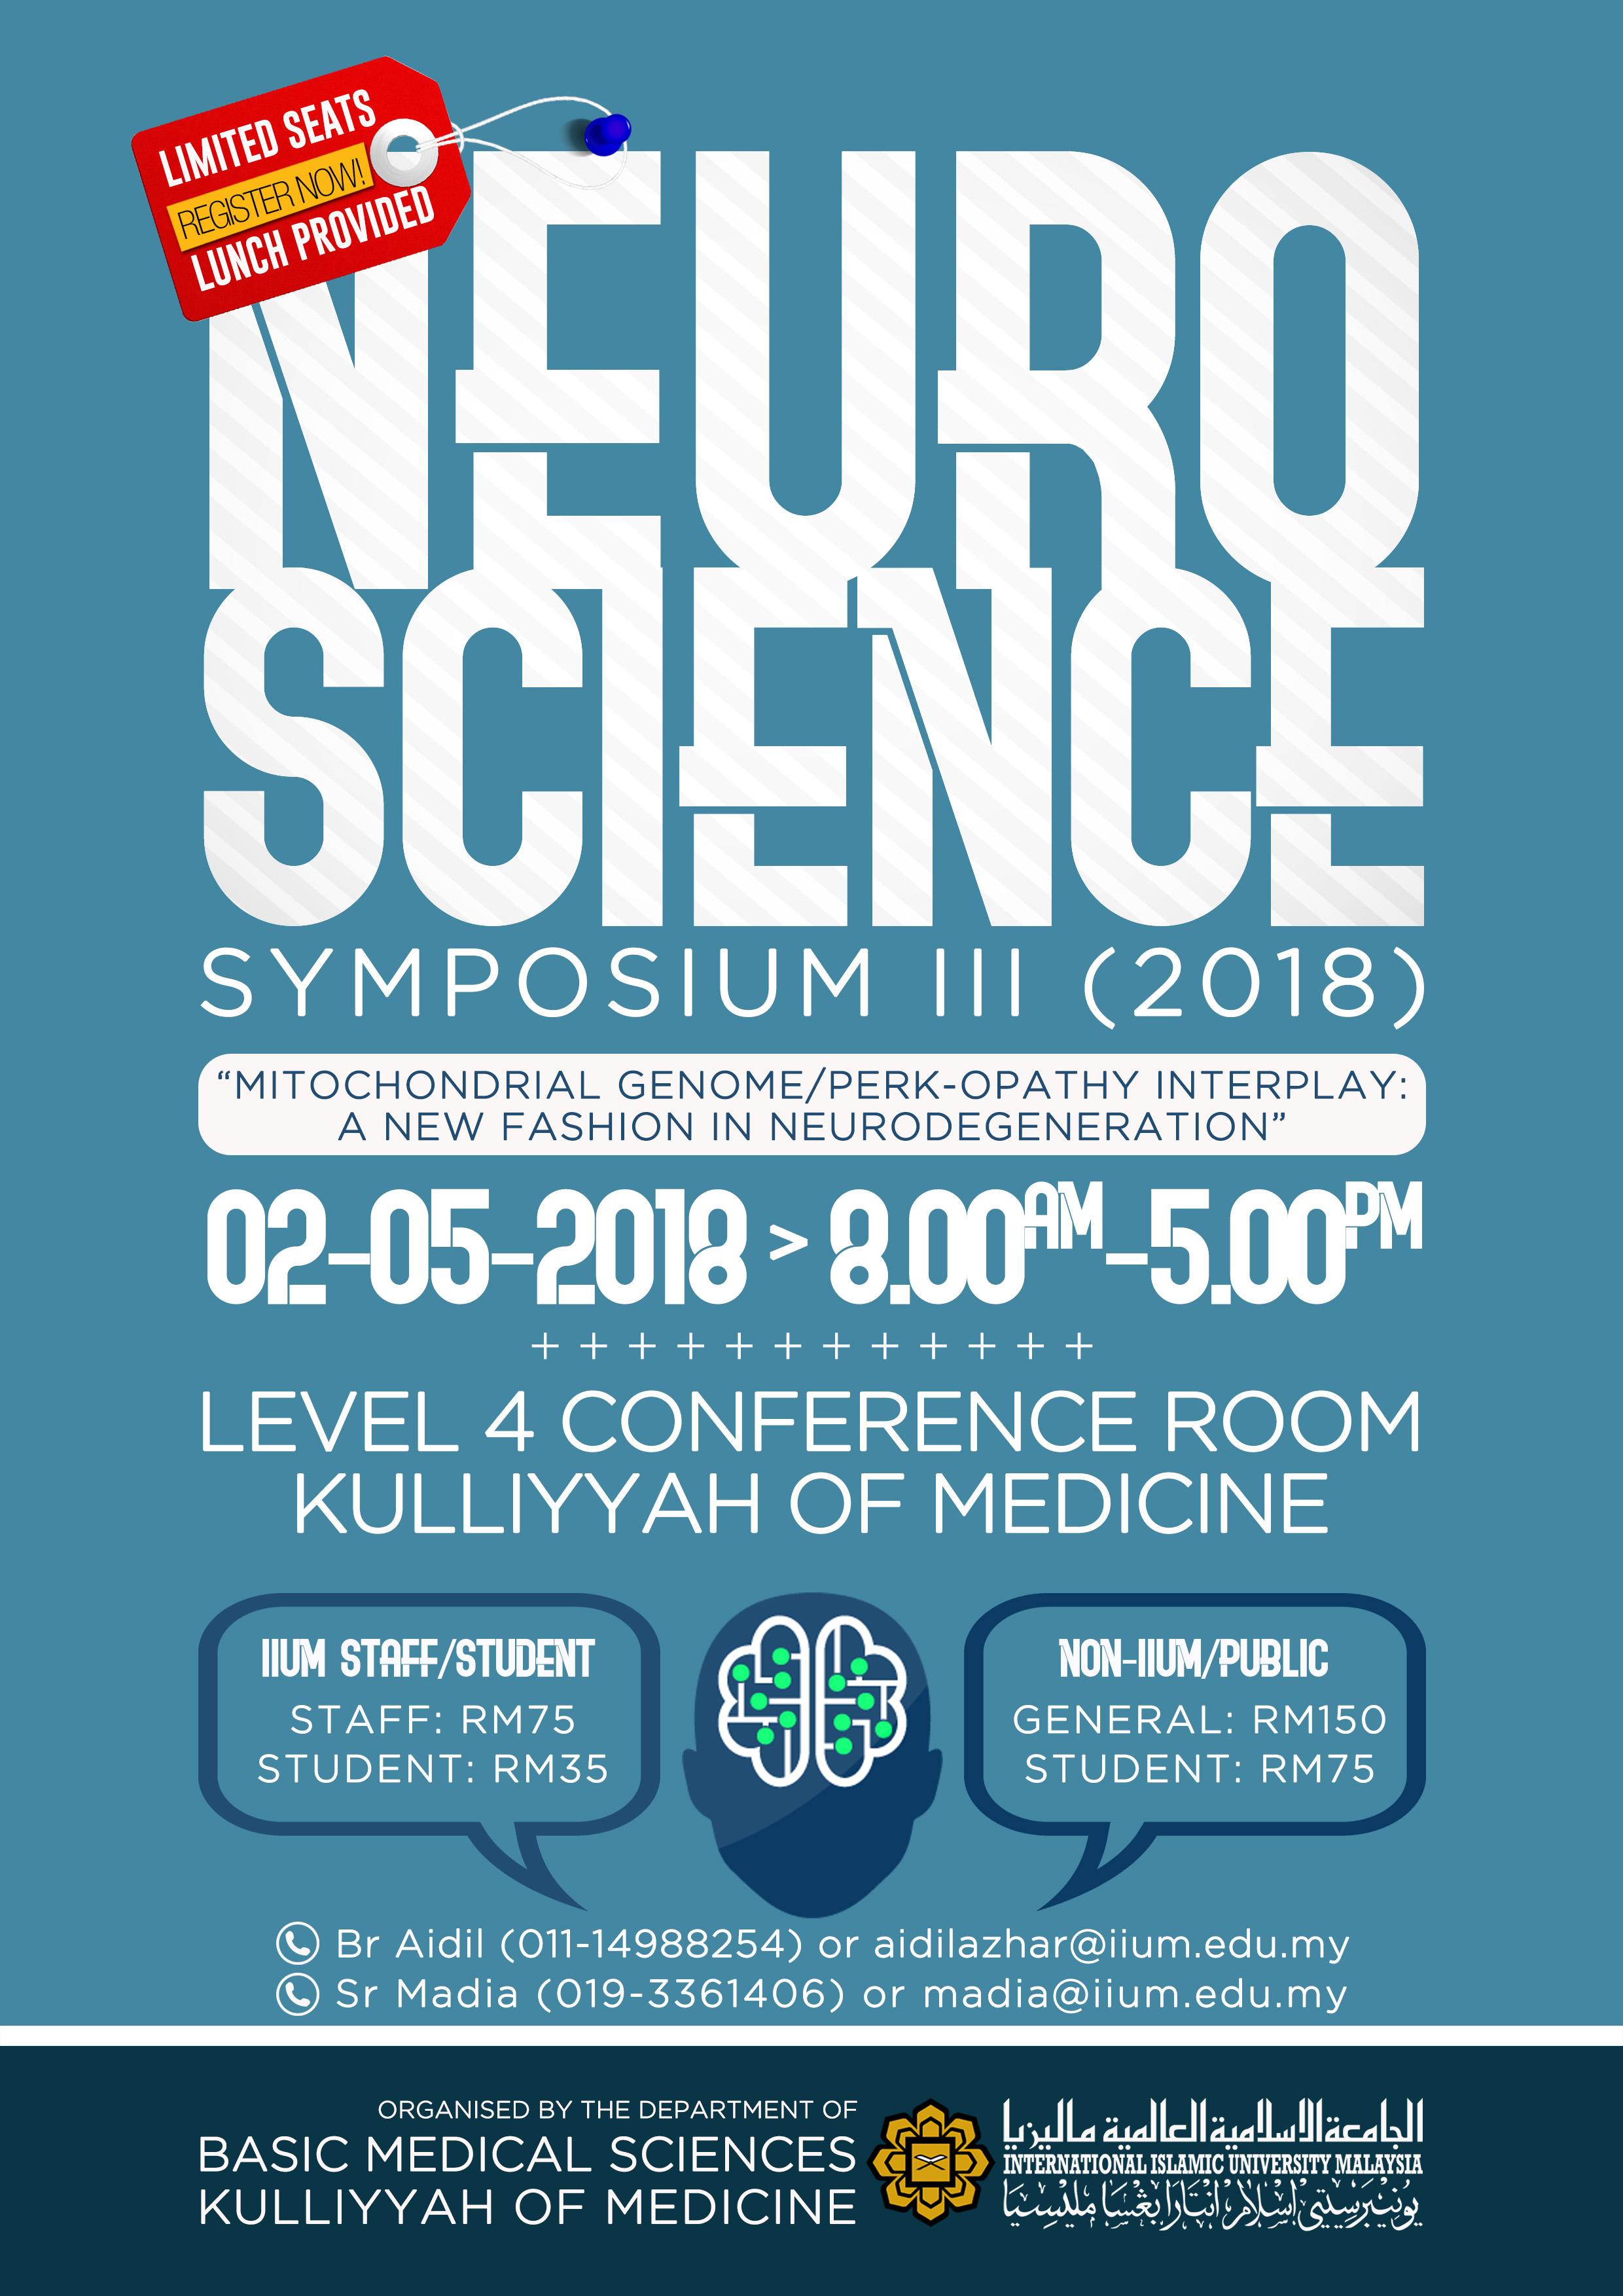 THE 3rd NEUROSCIENCE SYMPOSIUM 2018